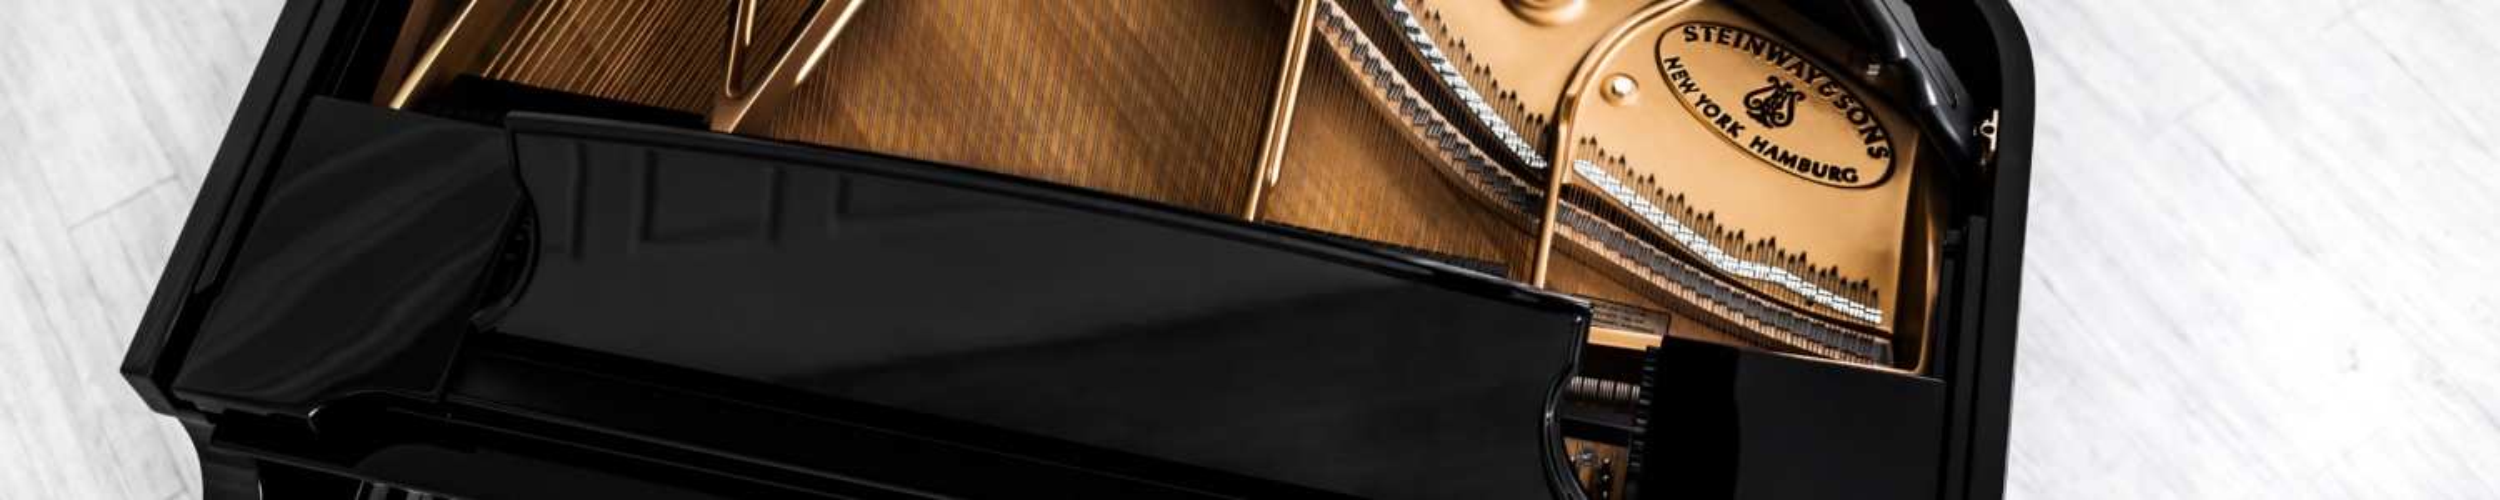 Steinway Piano Competition Belgium